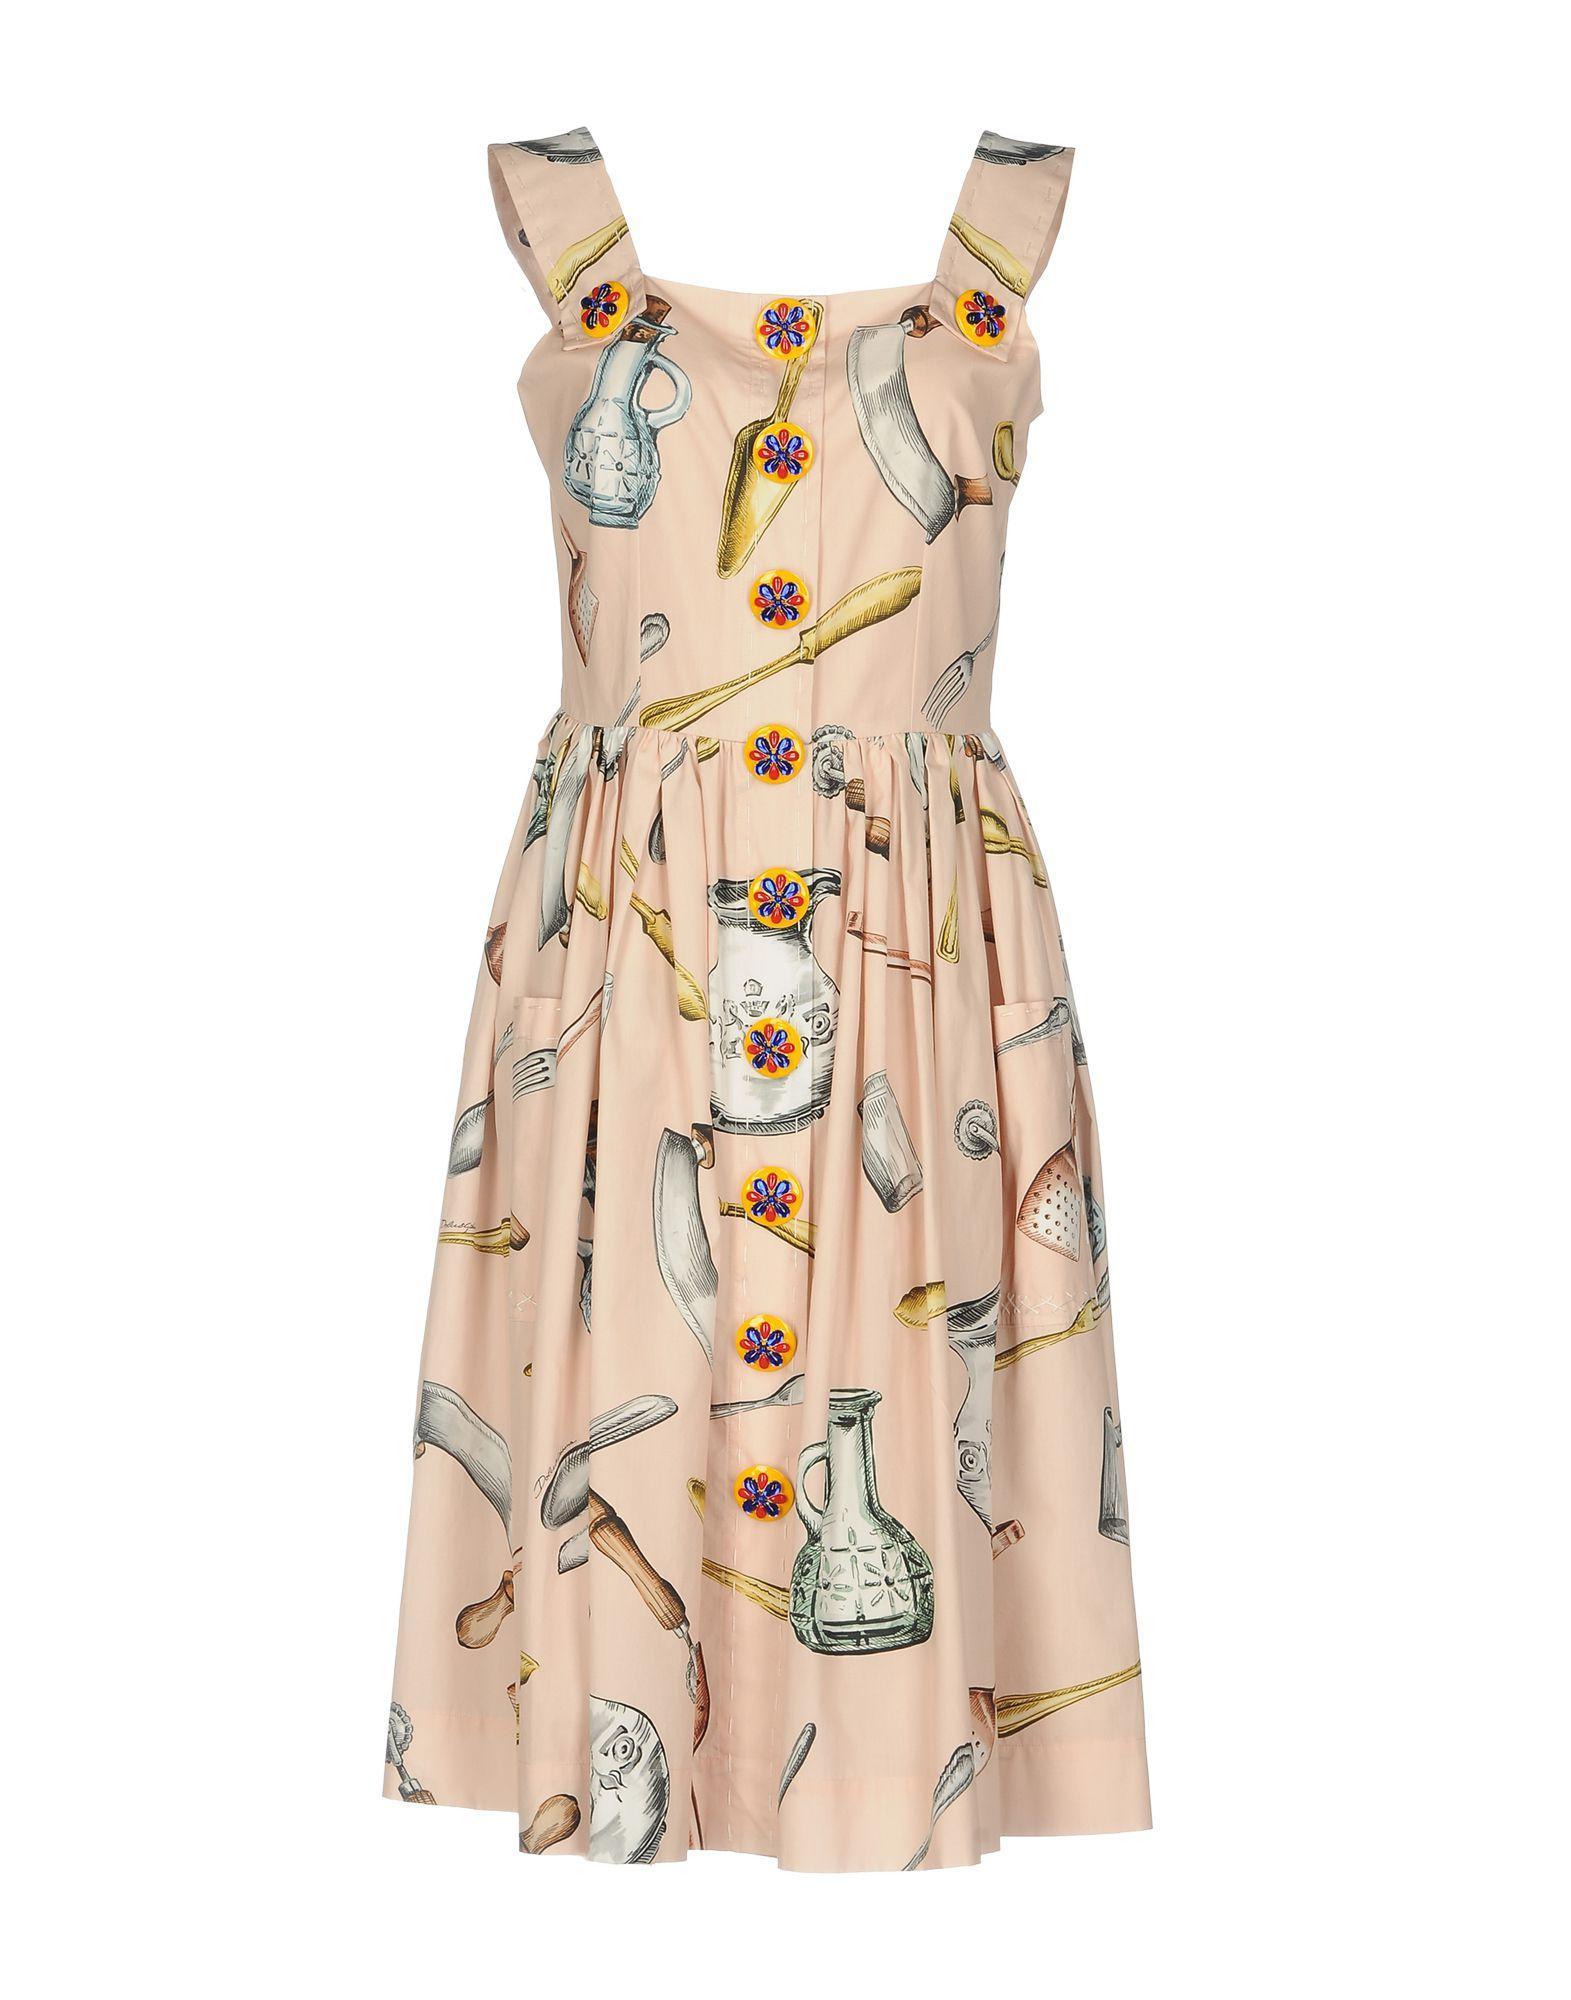 Dolce & Gabbana Knee-Length Dresses In Light Pink